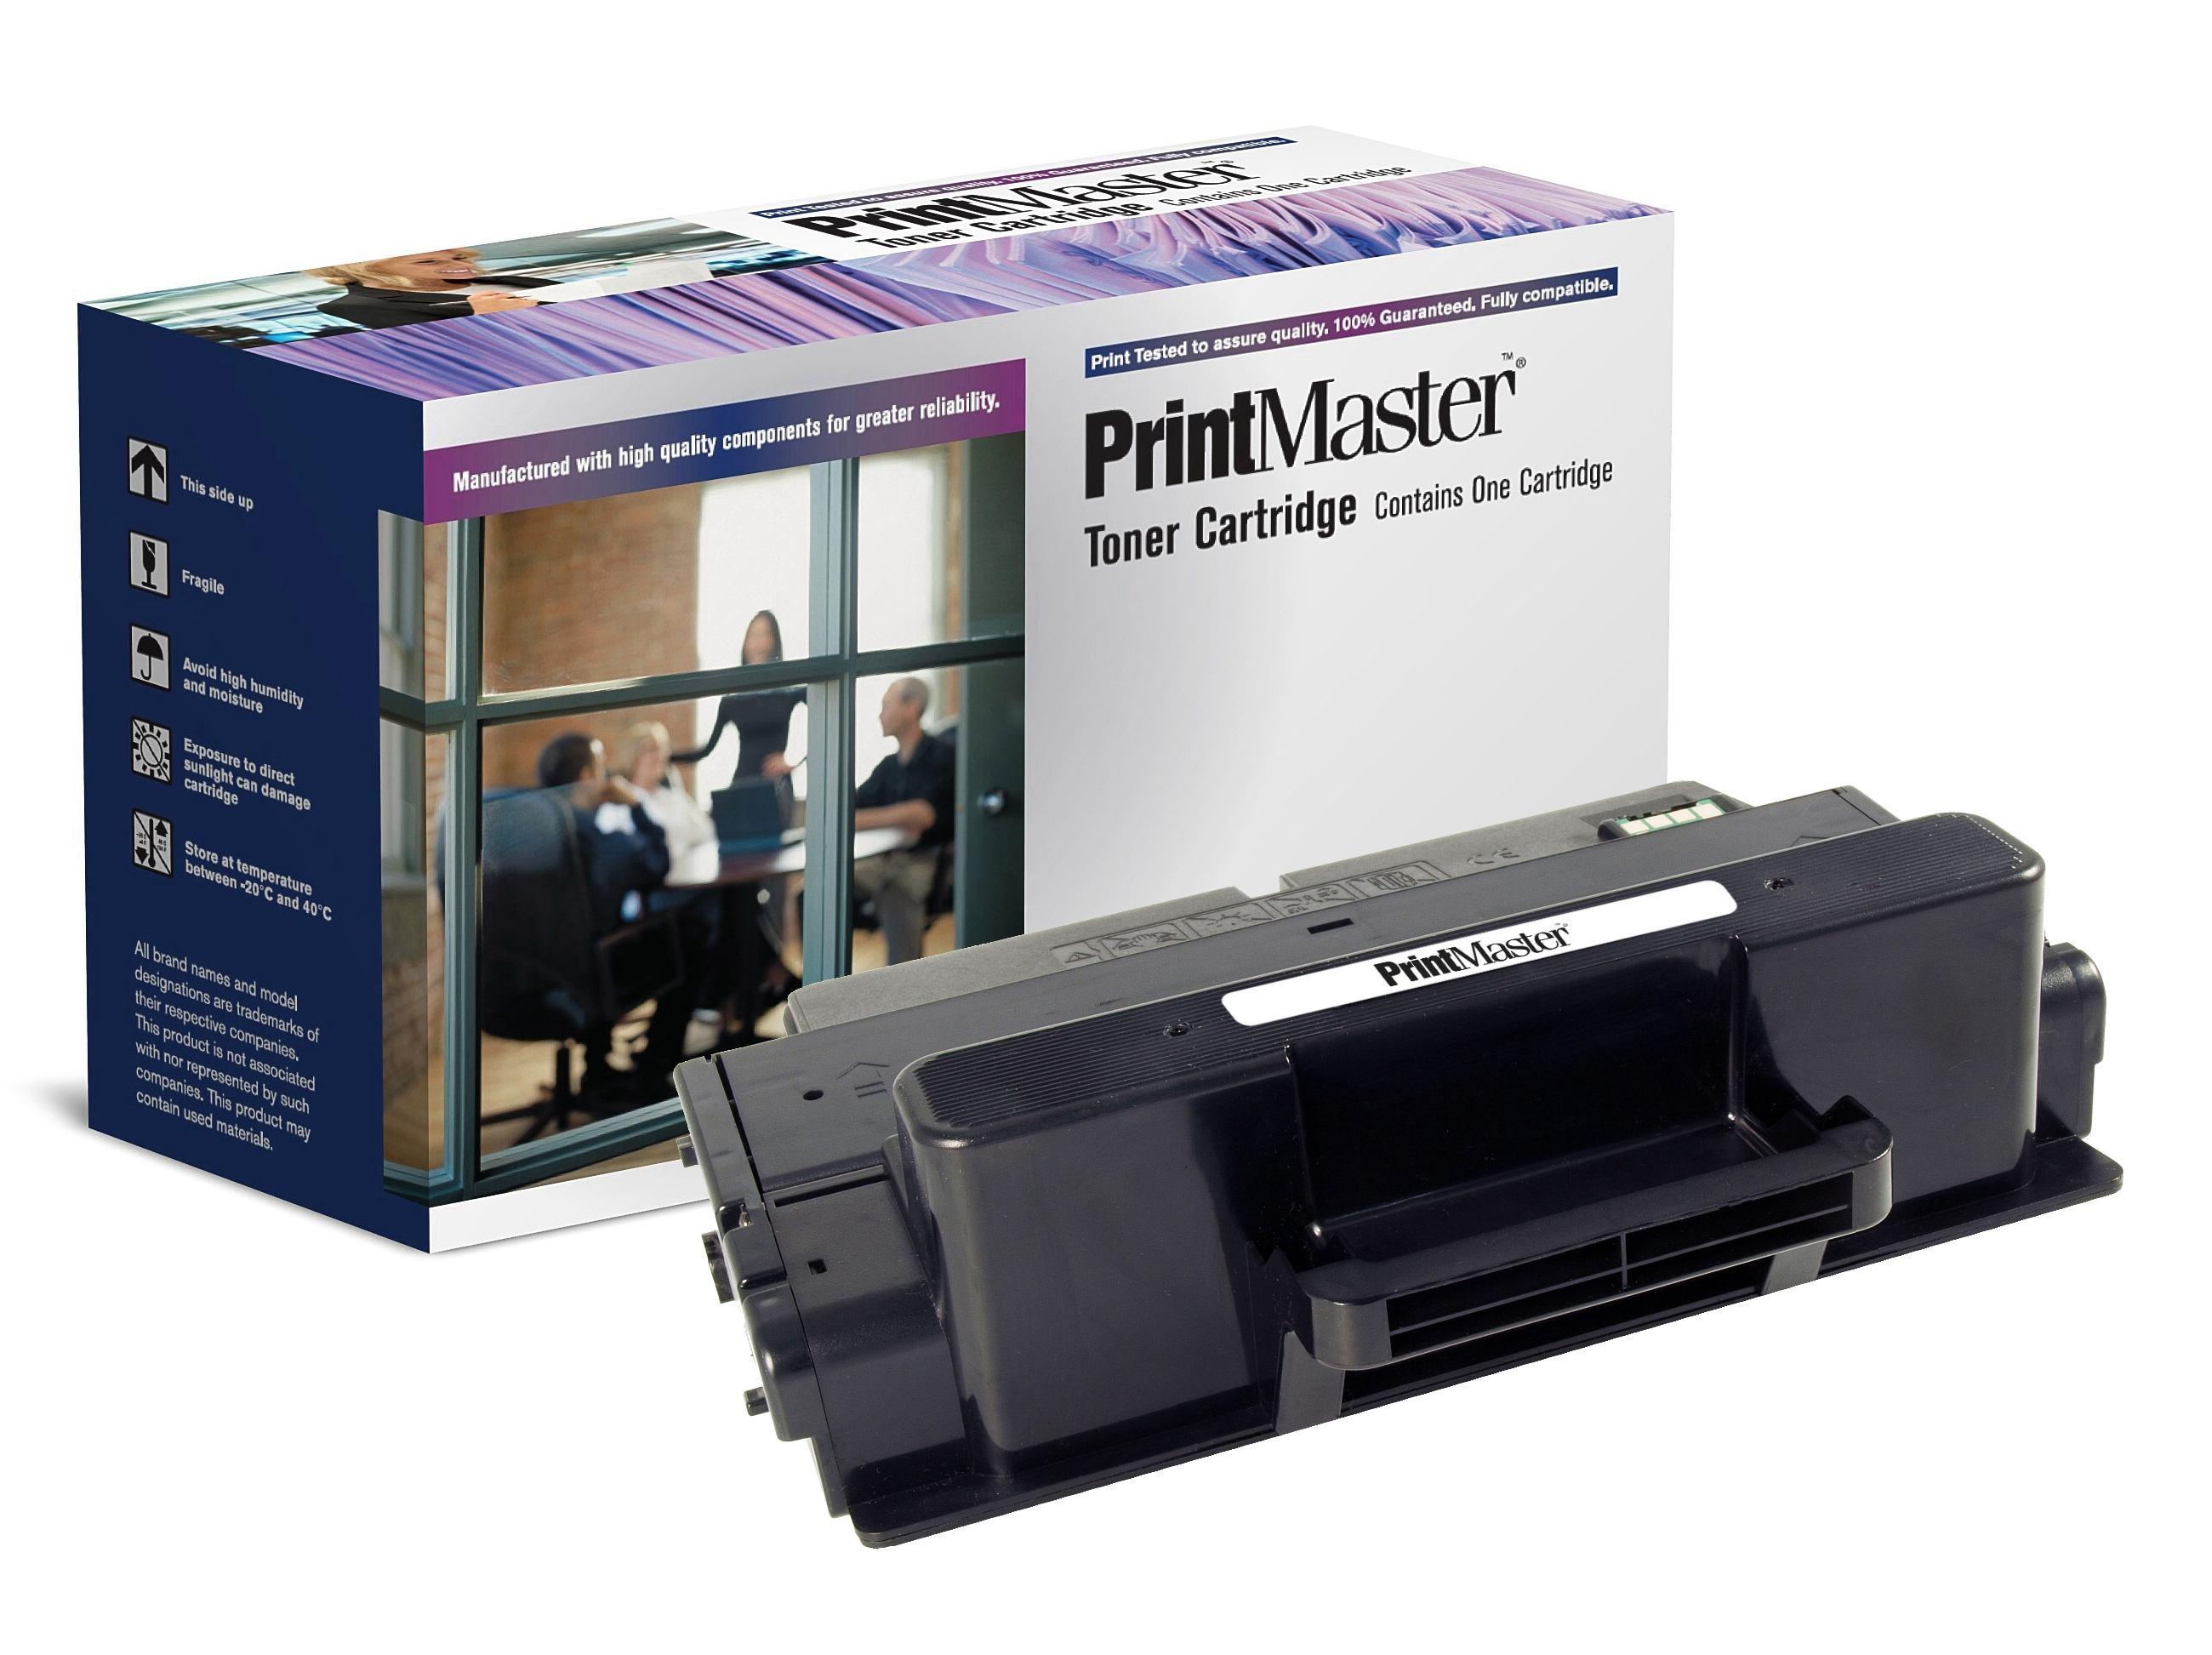 PrintMaster ML3310/Scx4833 Black Toner 5K